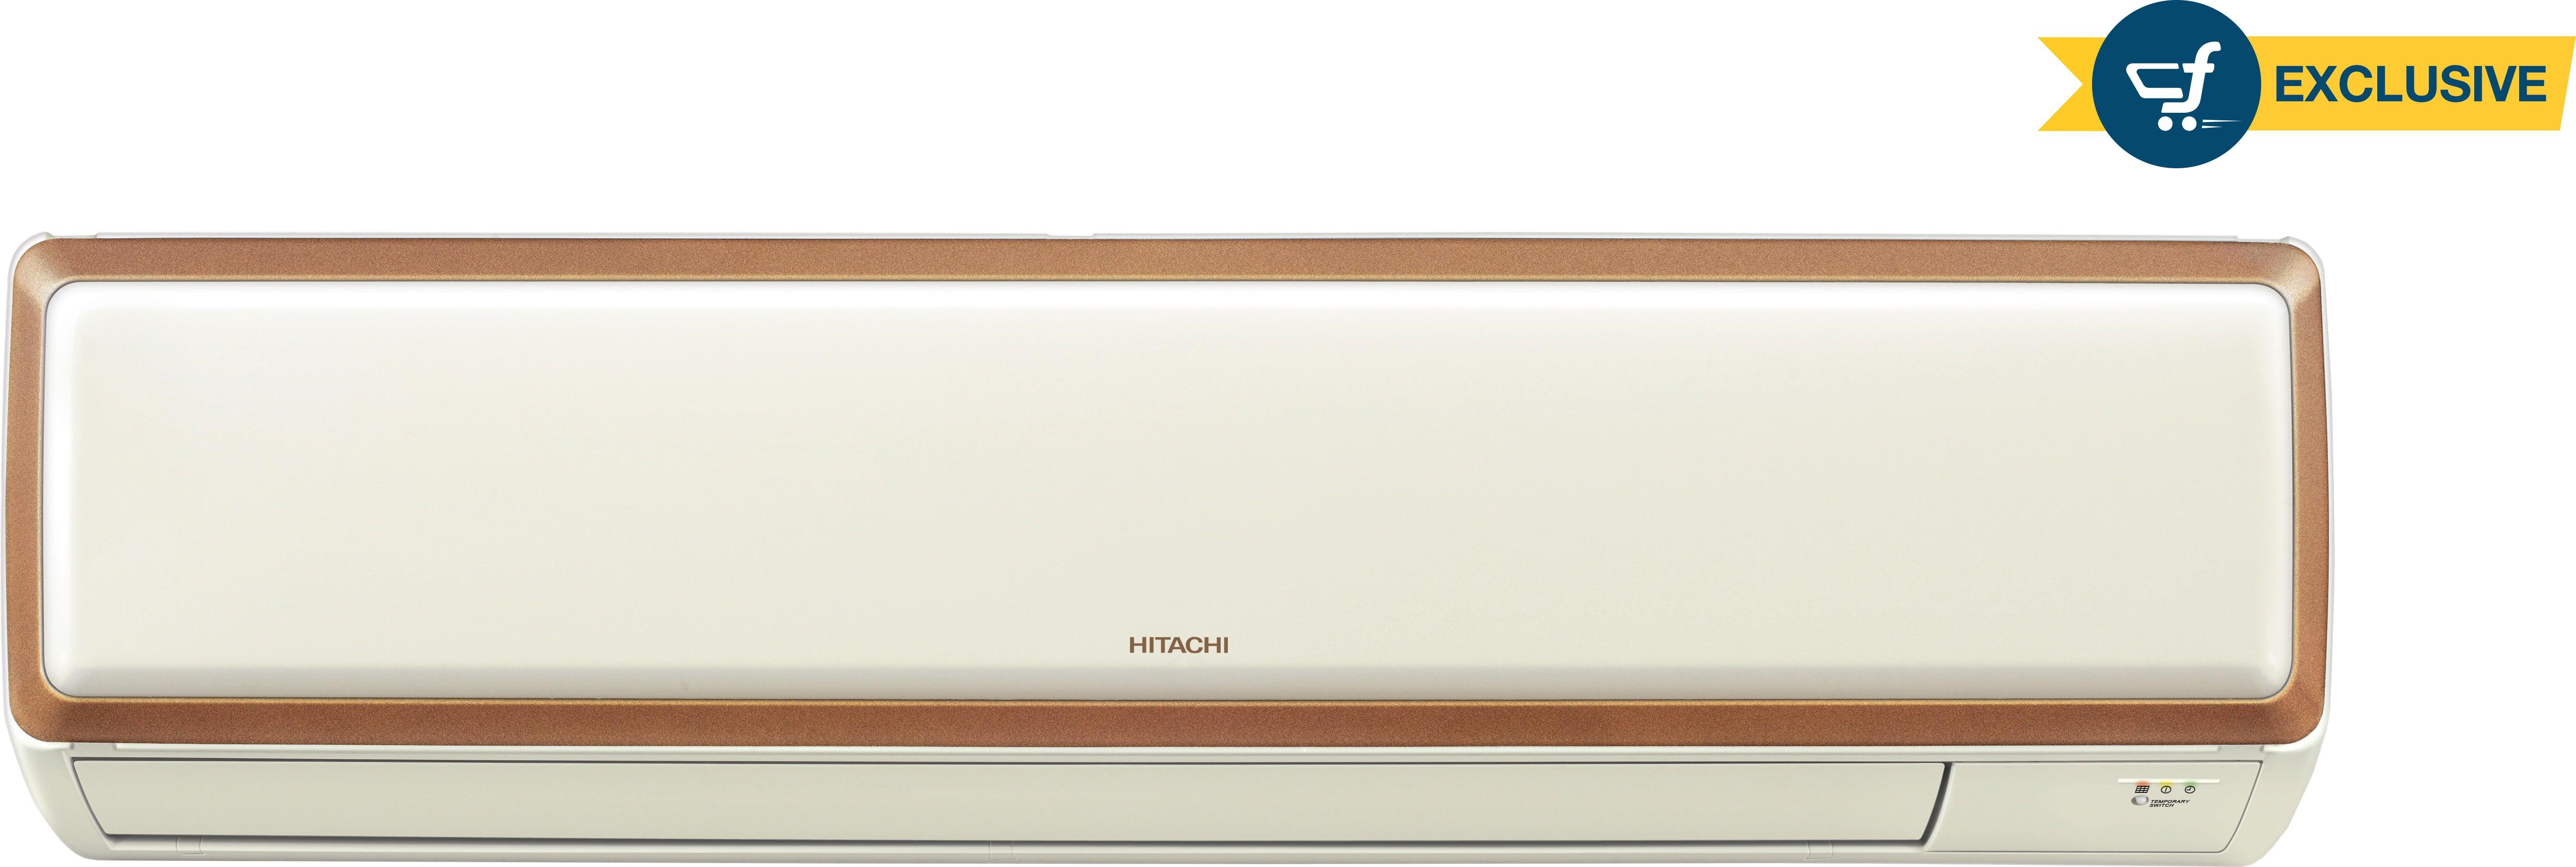 Hitachi 1 Ton 3 Star Split AC White (Hitachi)  Buy Online